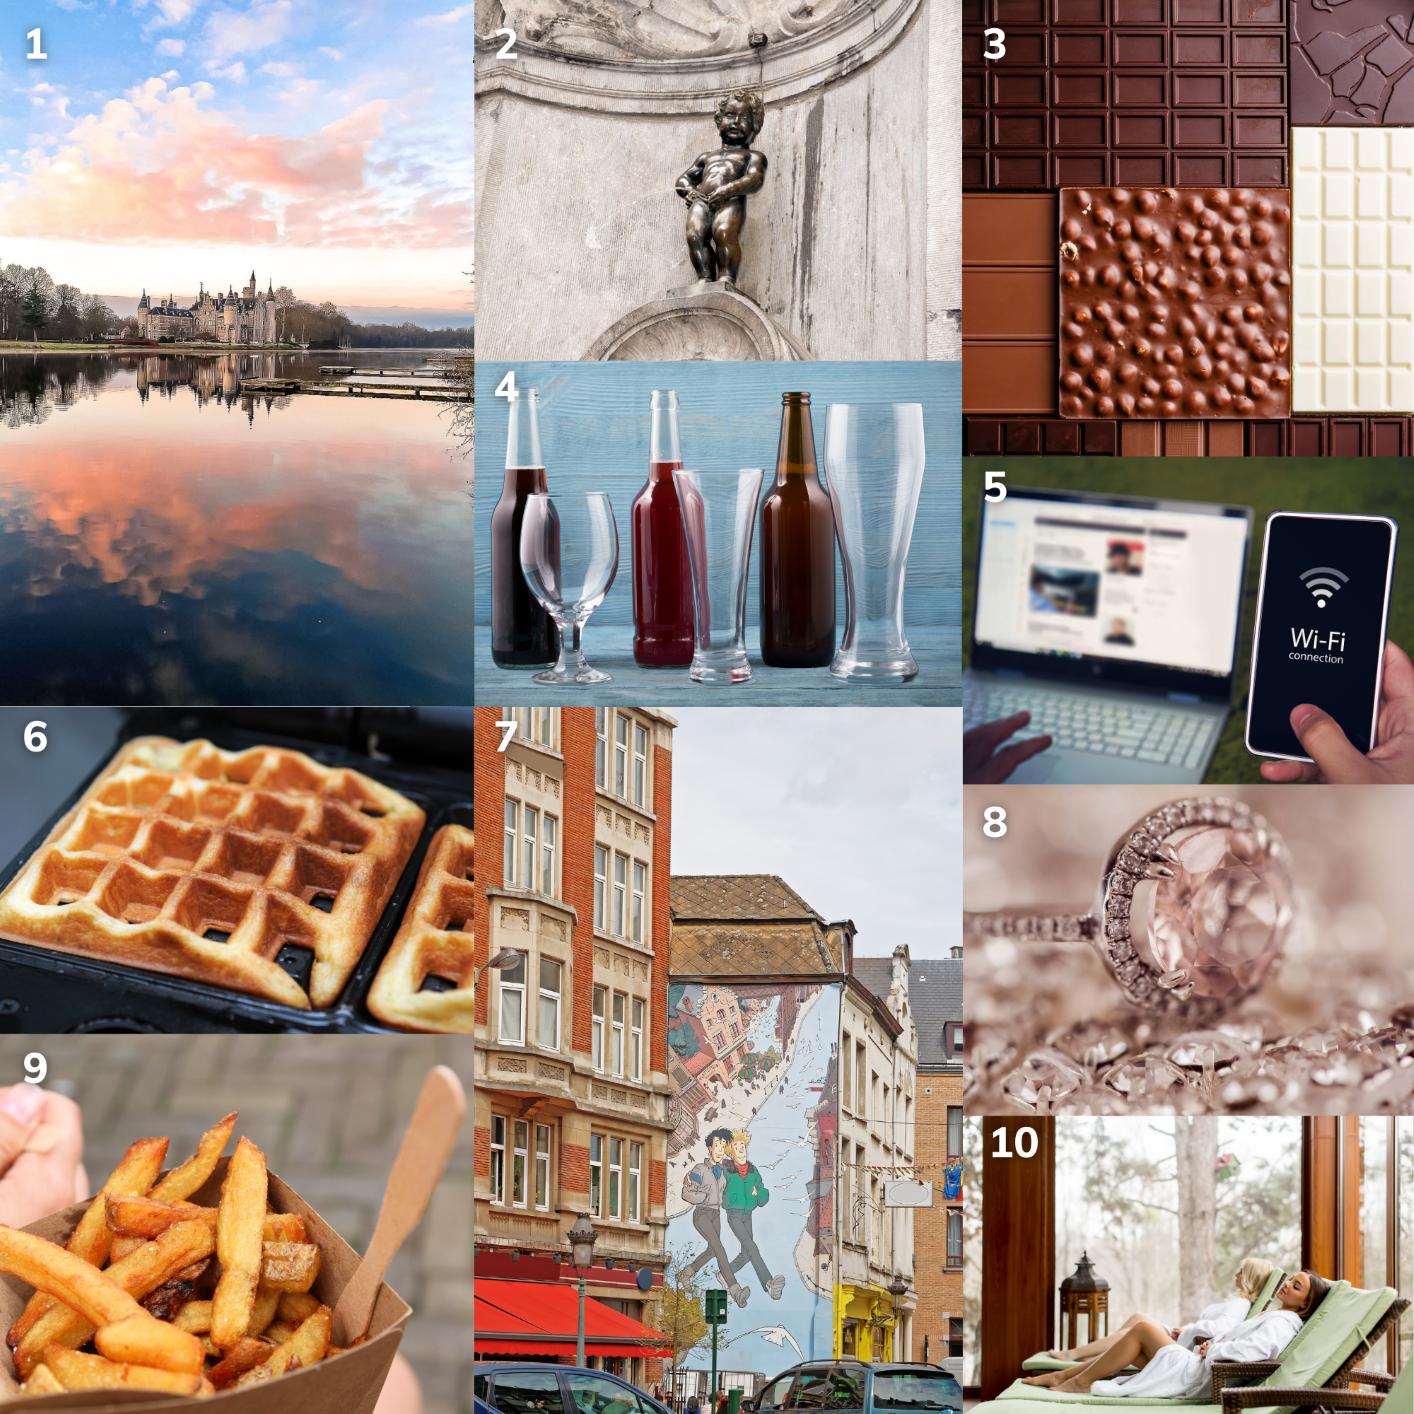 Image collage featuring Manneken Pis, Belgian chocolate, and Antwerp diamonds